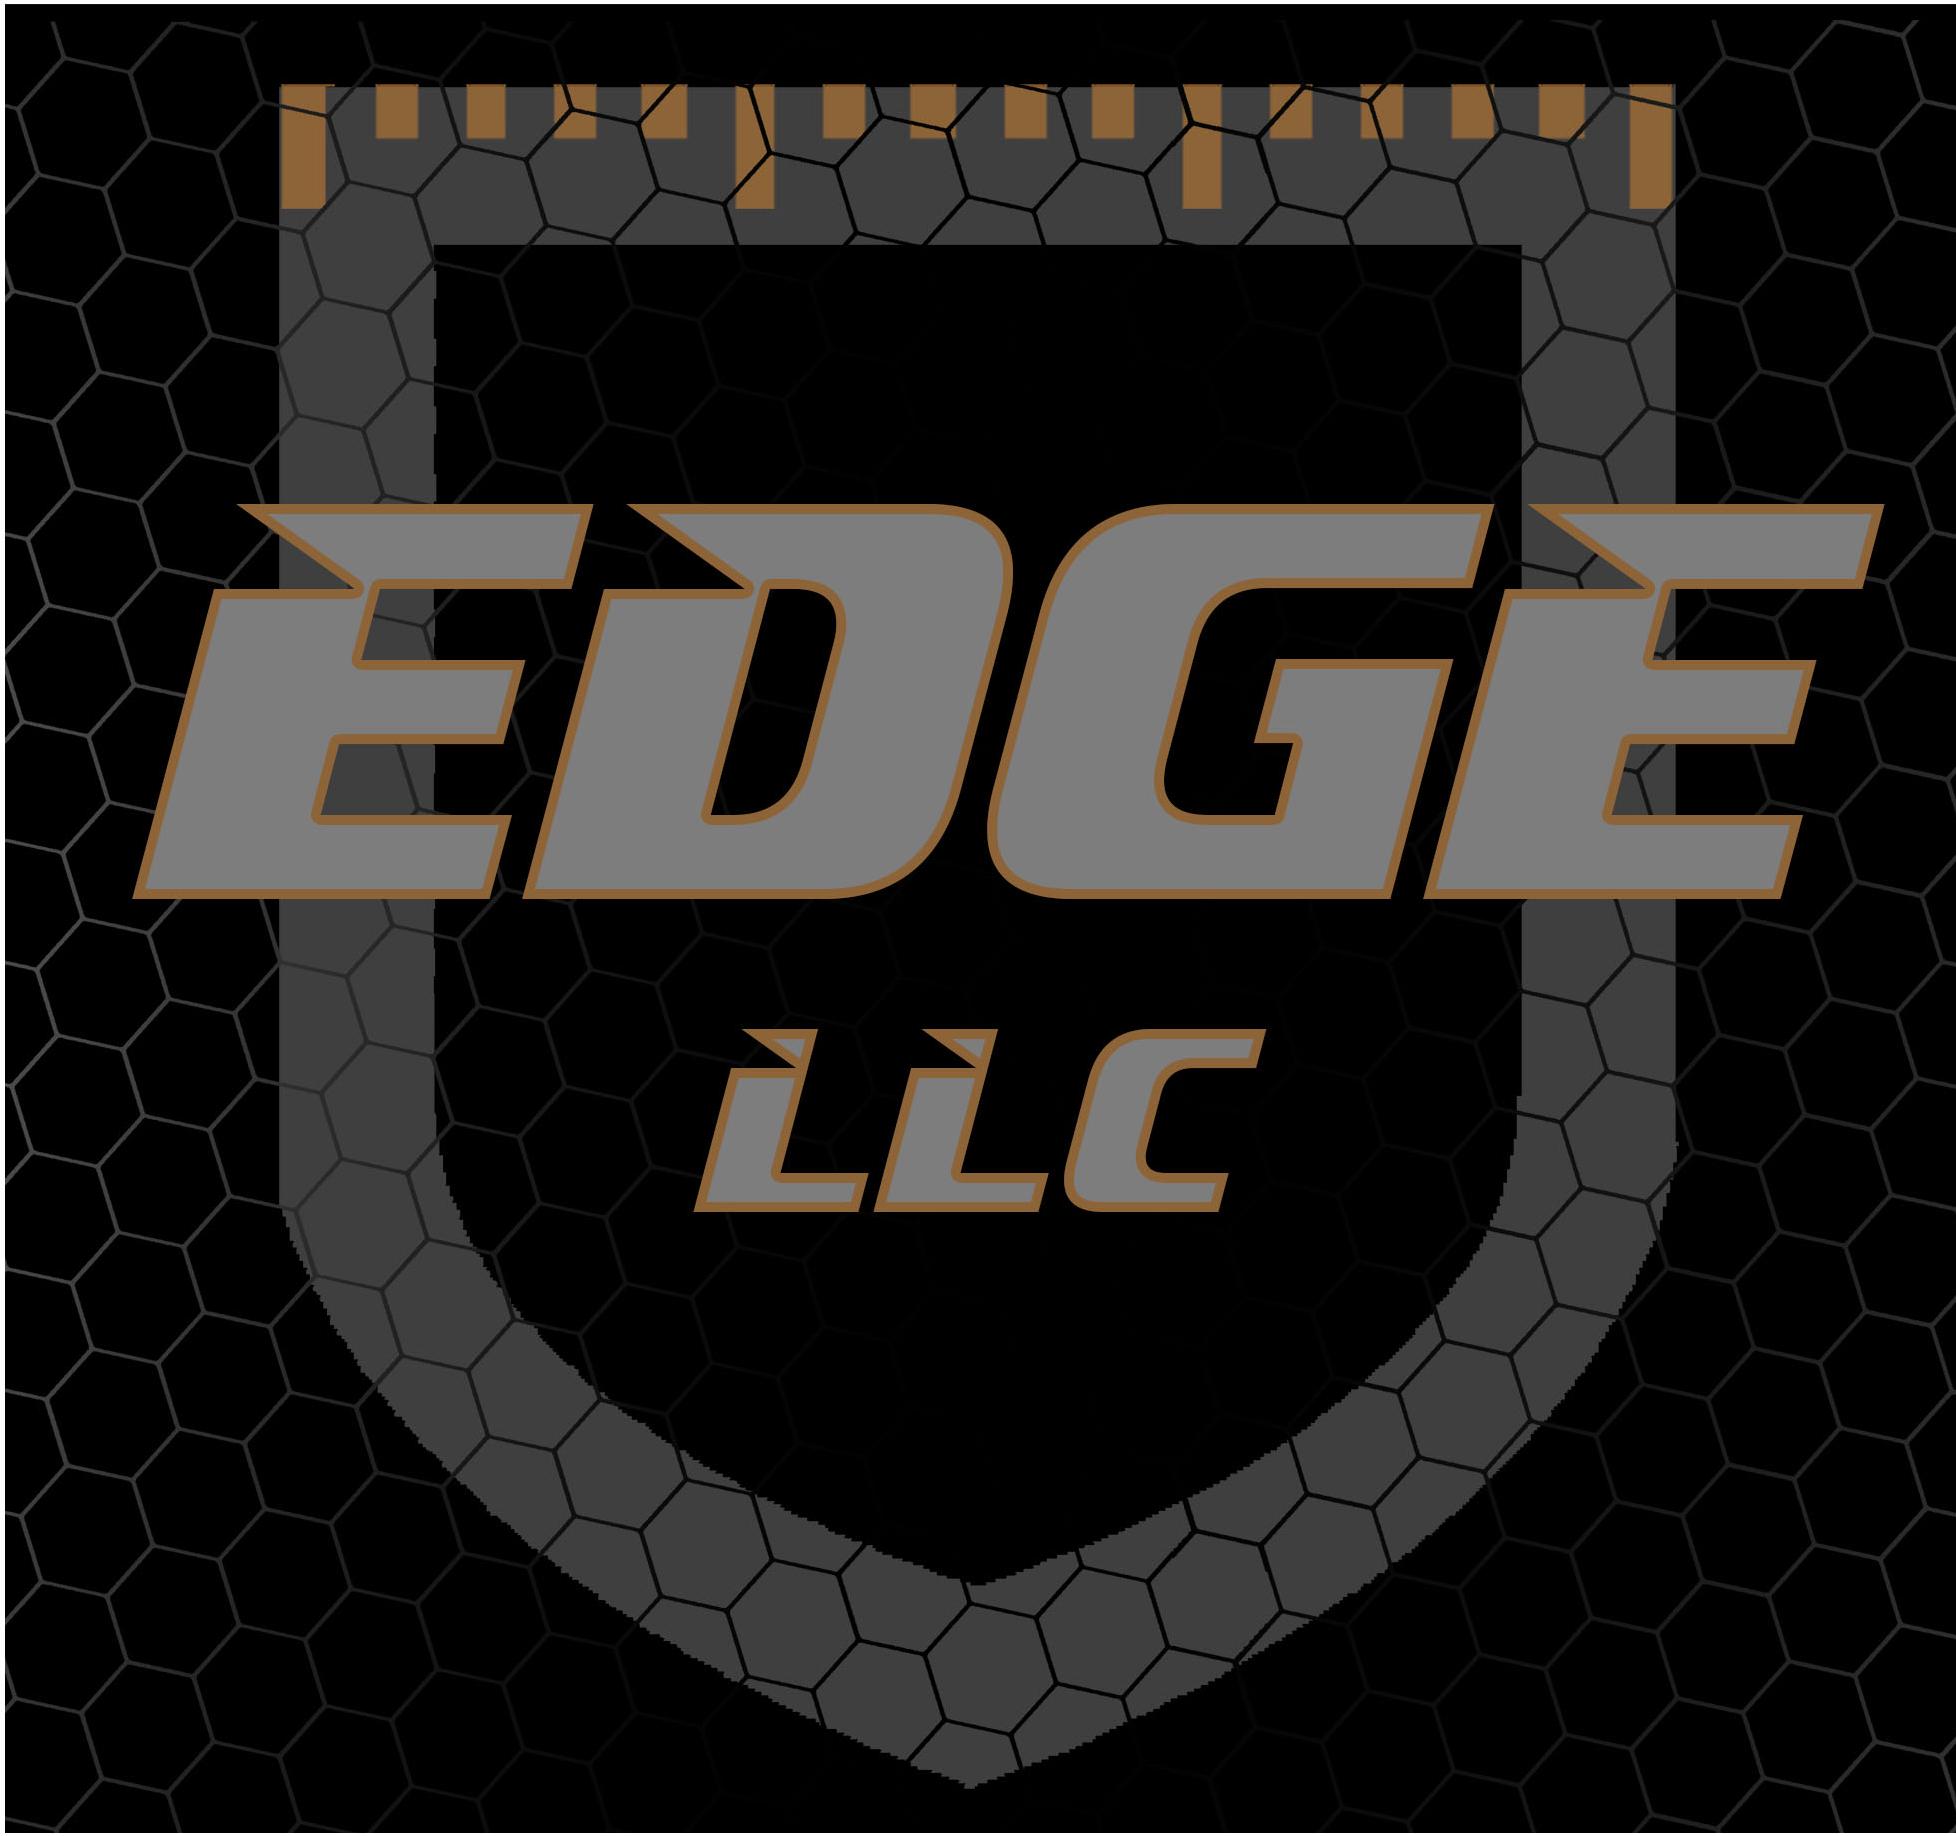 Edge Square.png